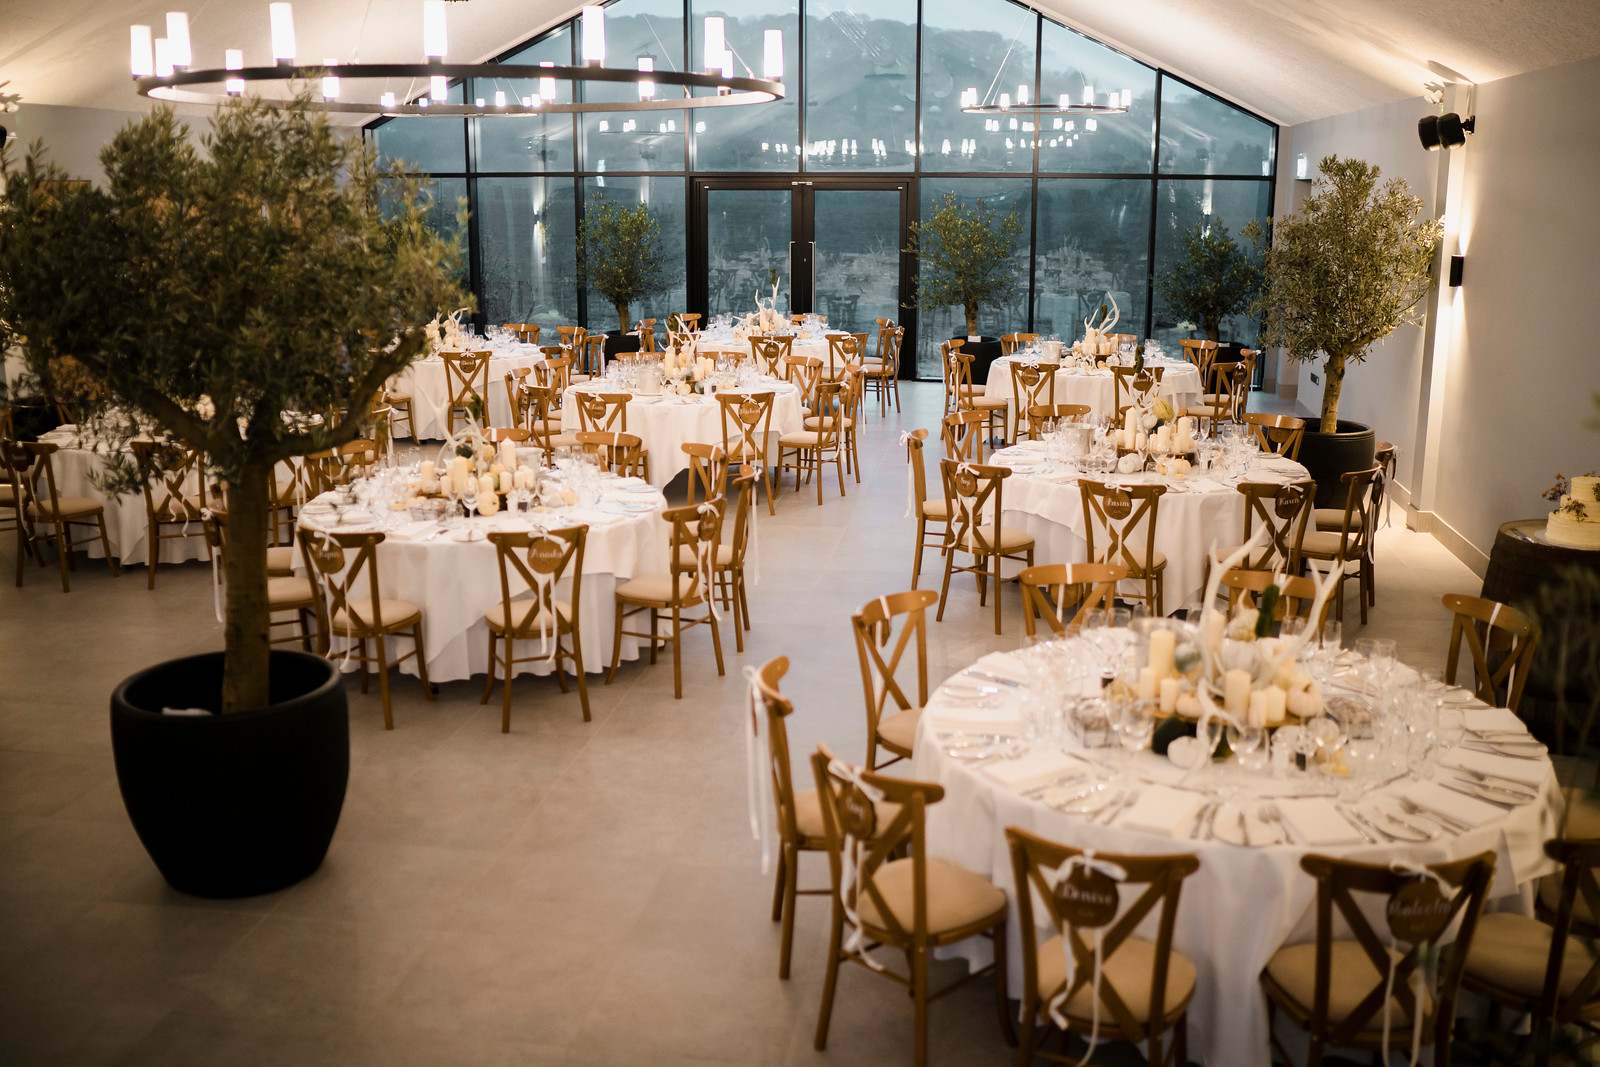 Rustic Theme Wedding Table Plan